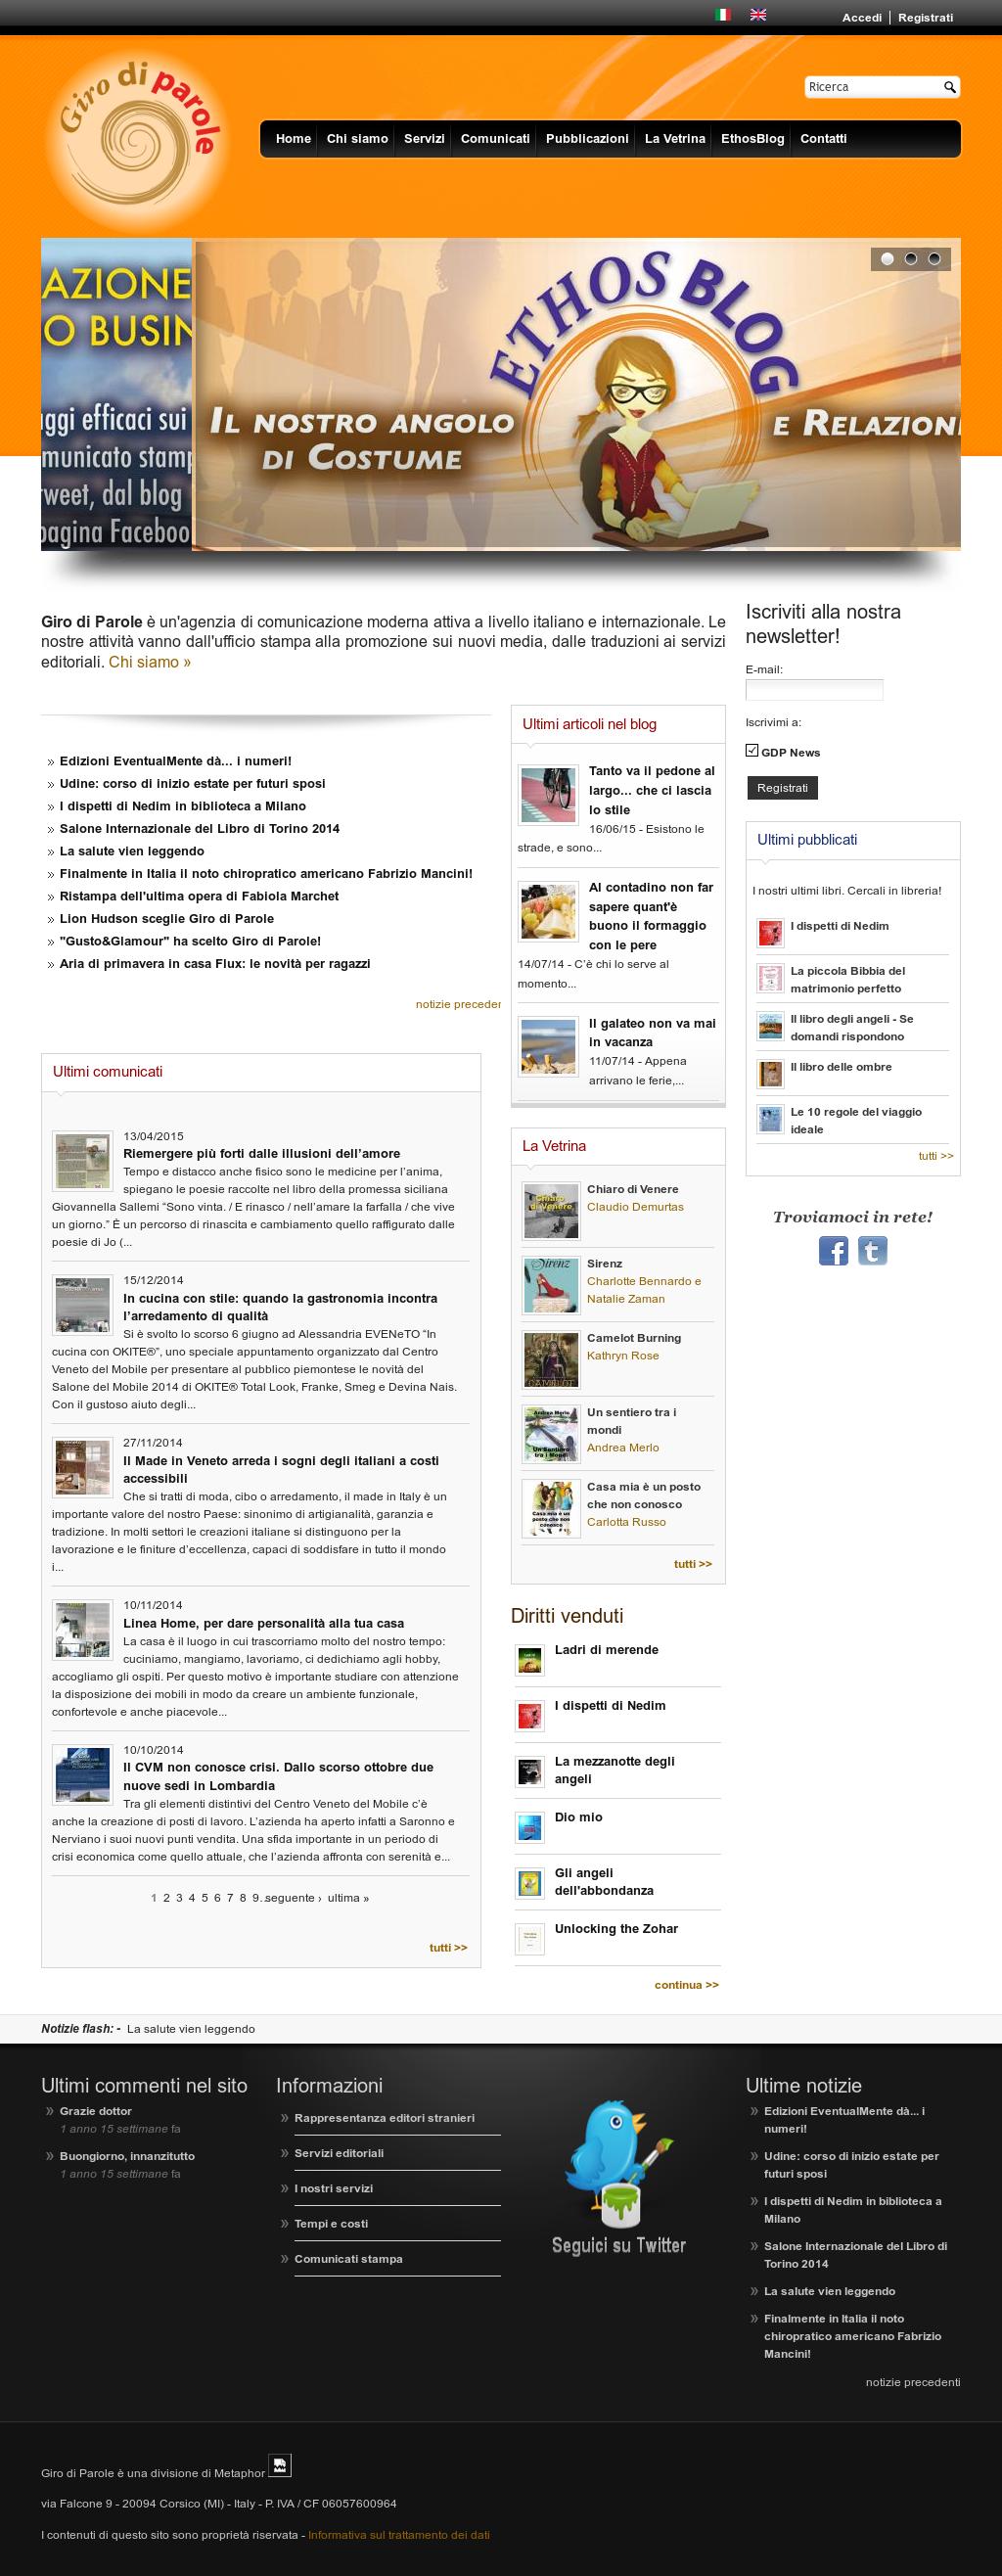 Giro Di Parole Metaphor Competitors, Revenue and Employees ...